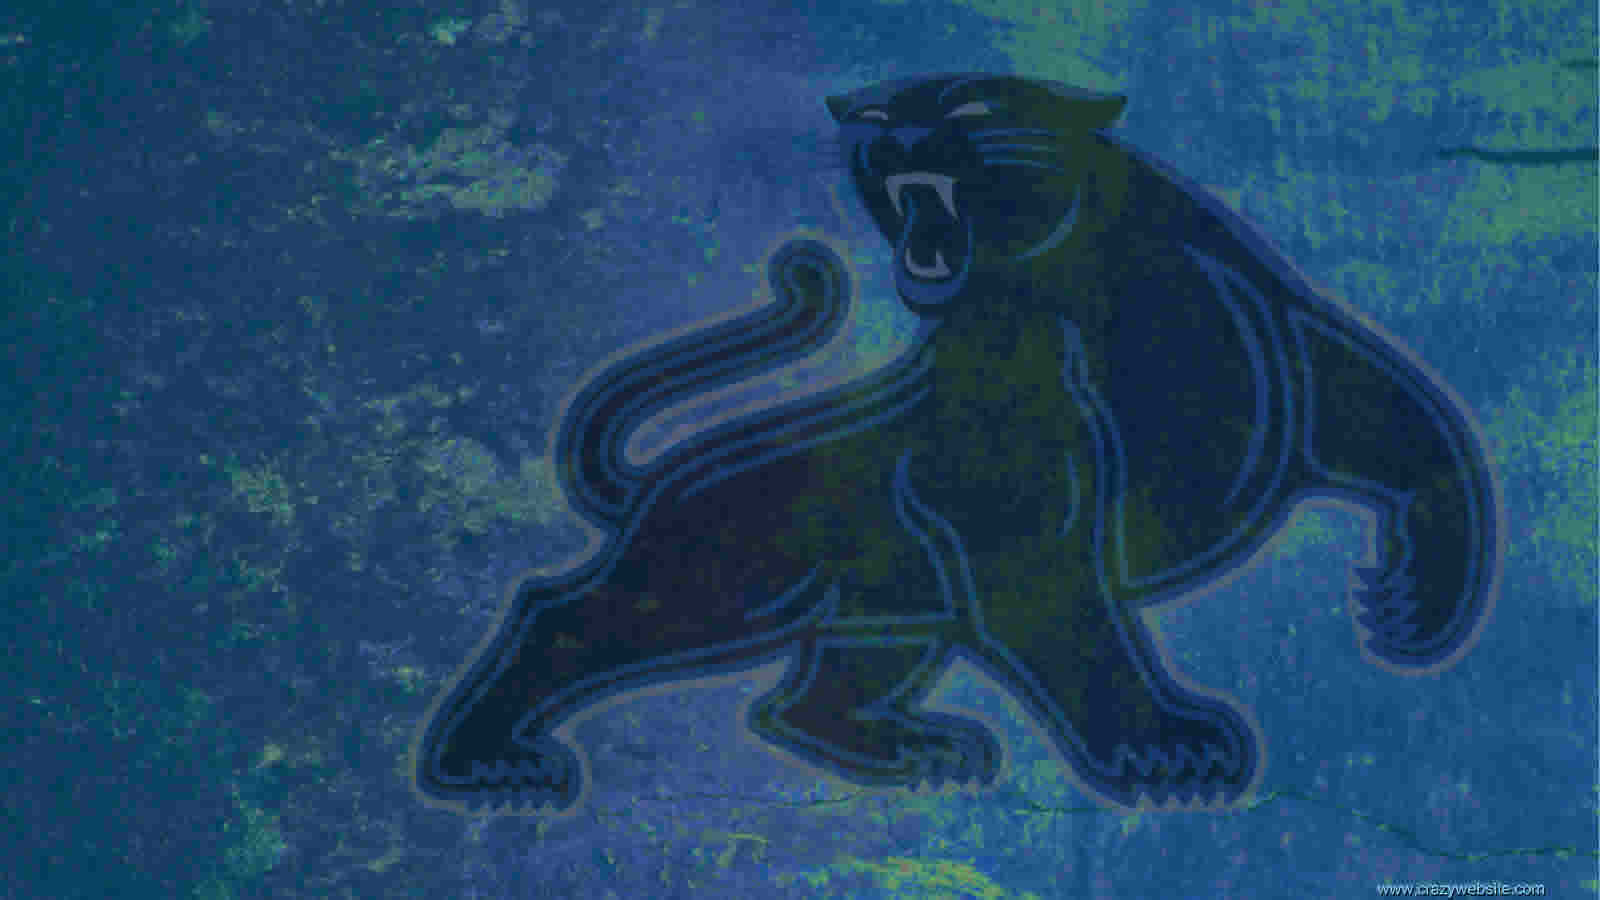 Carolina Panthers full figure panther official team logo wallpaper 1600x900